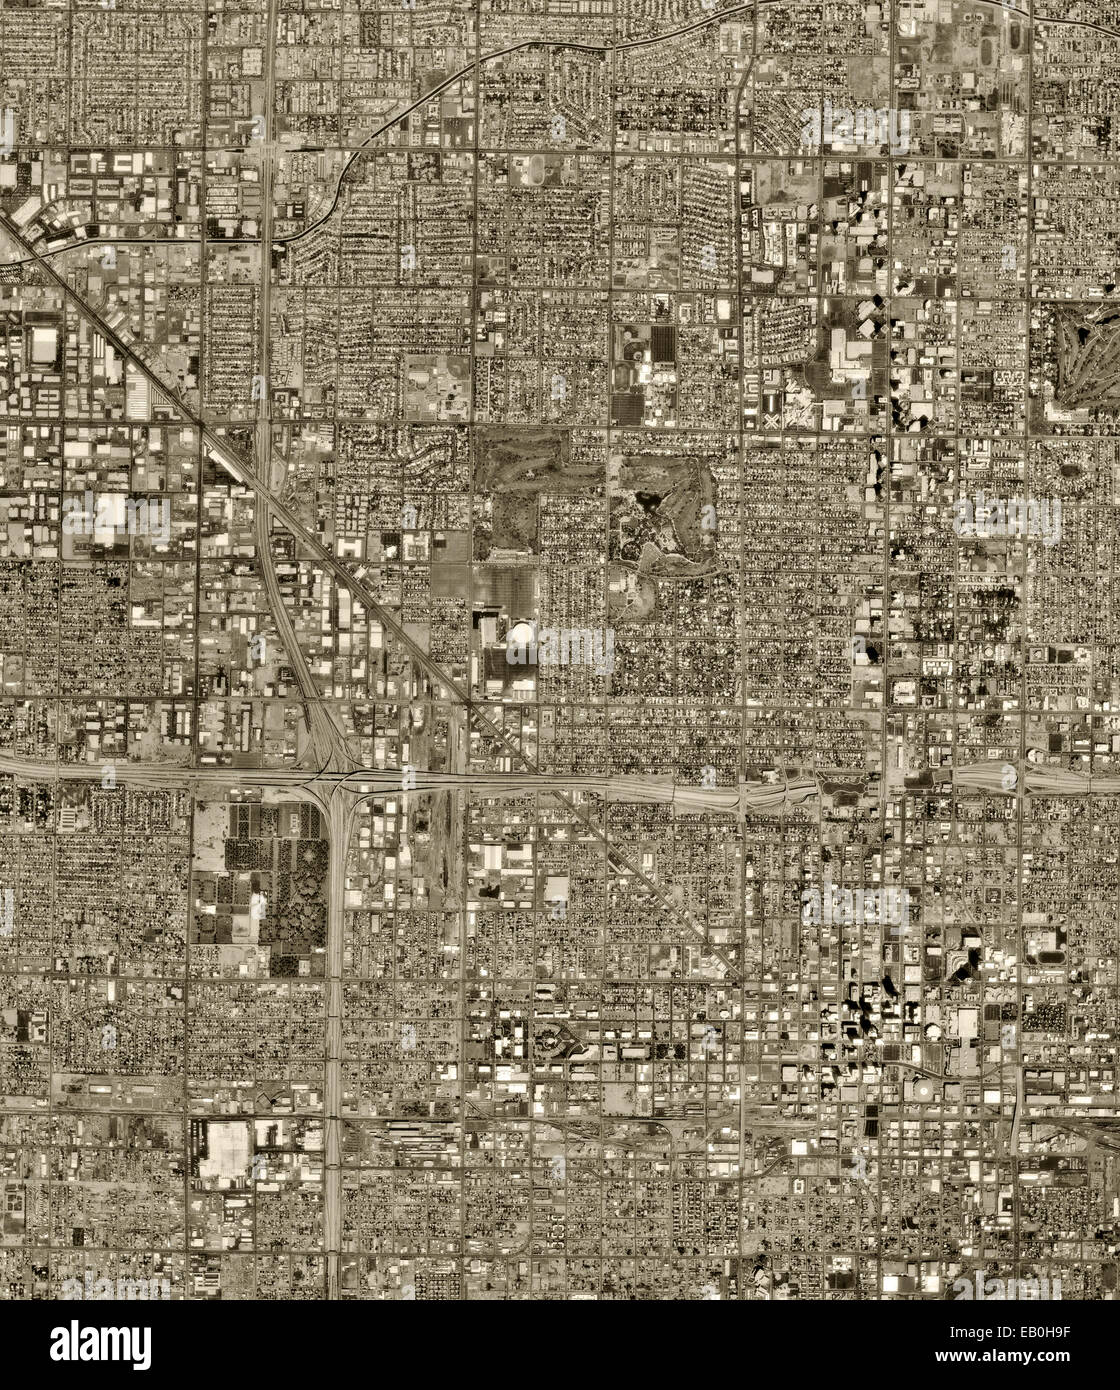 historical aerial photograph of Phoenix, Arizona, 1961 - Stock Image